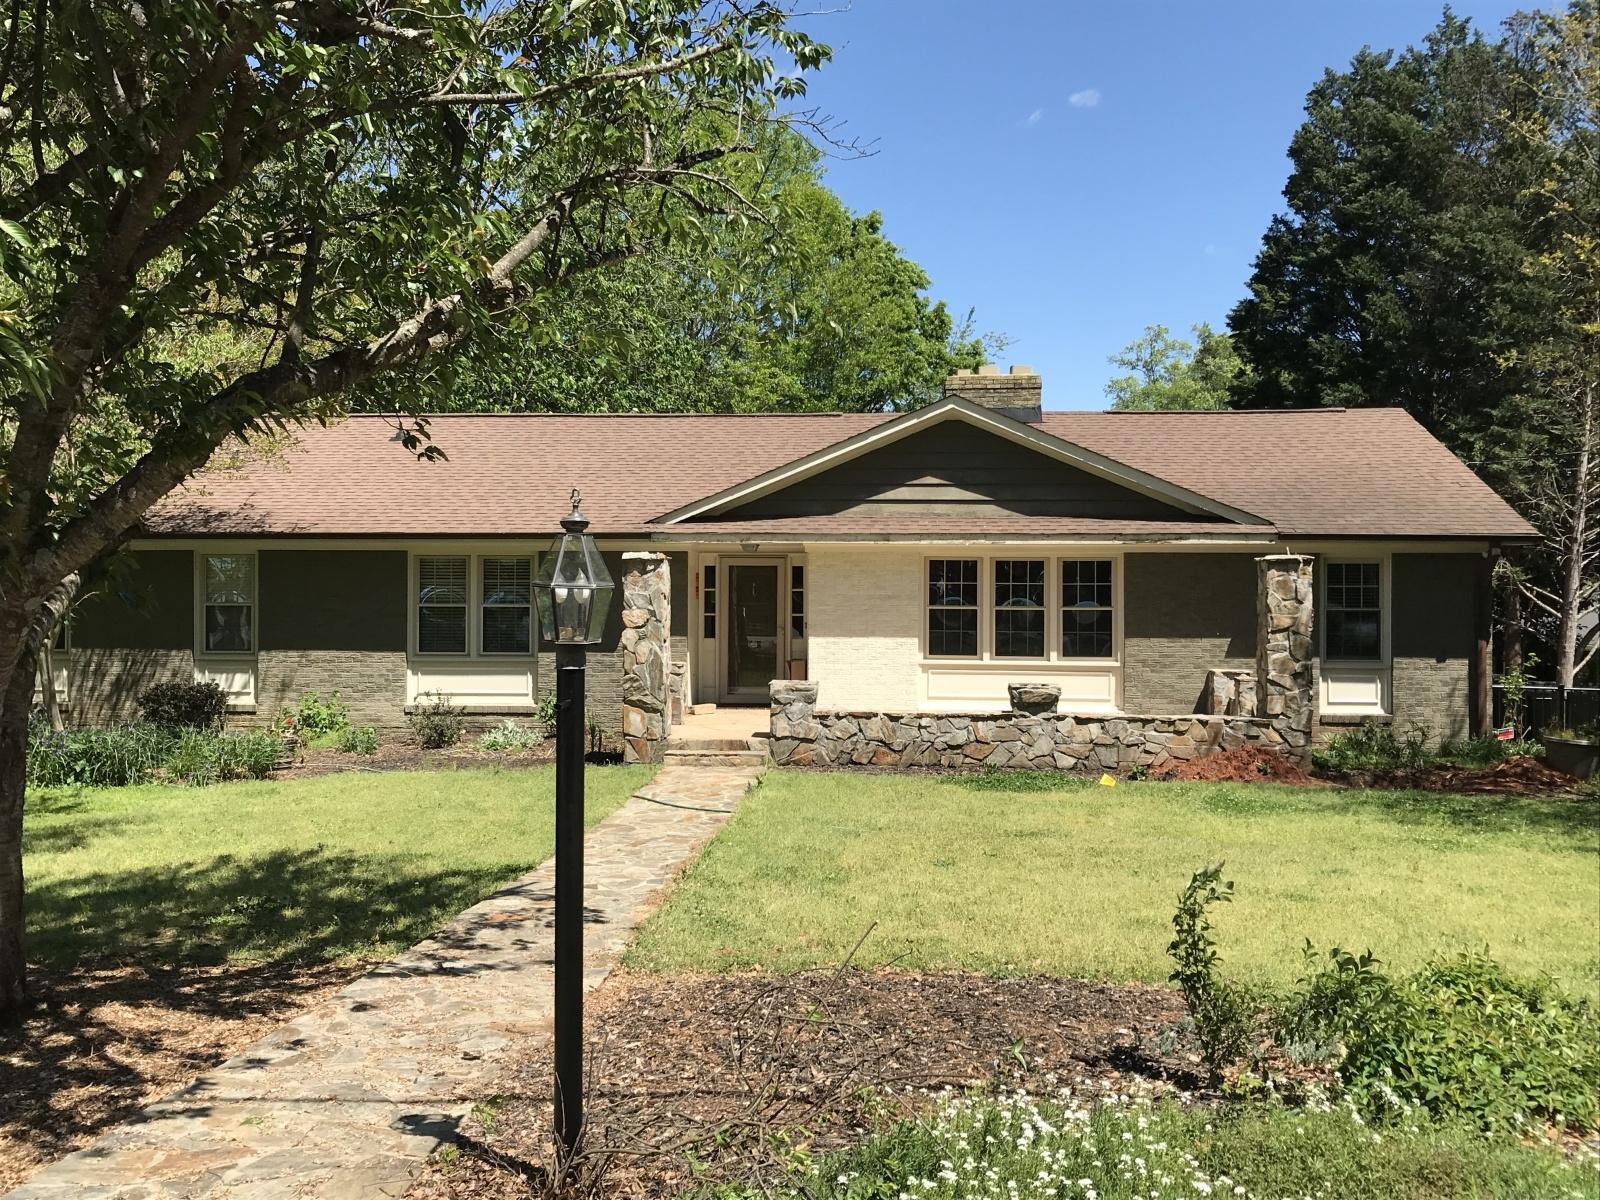 1_33-sa-front-porch-addition-5